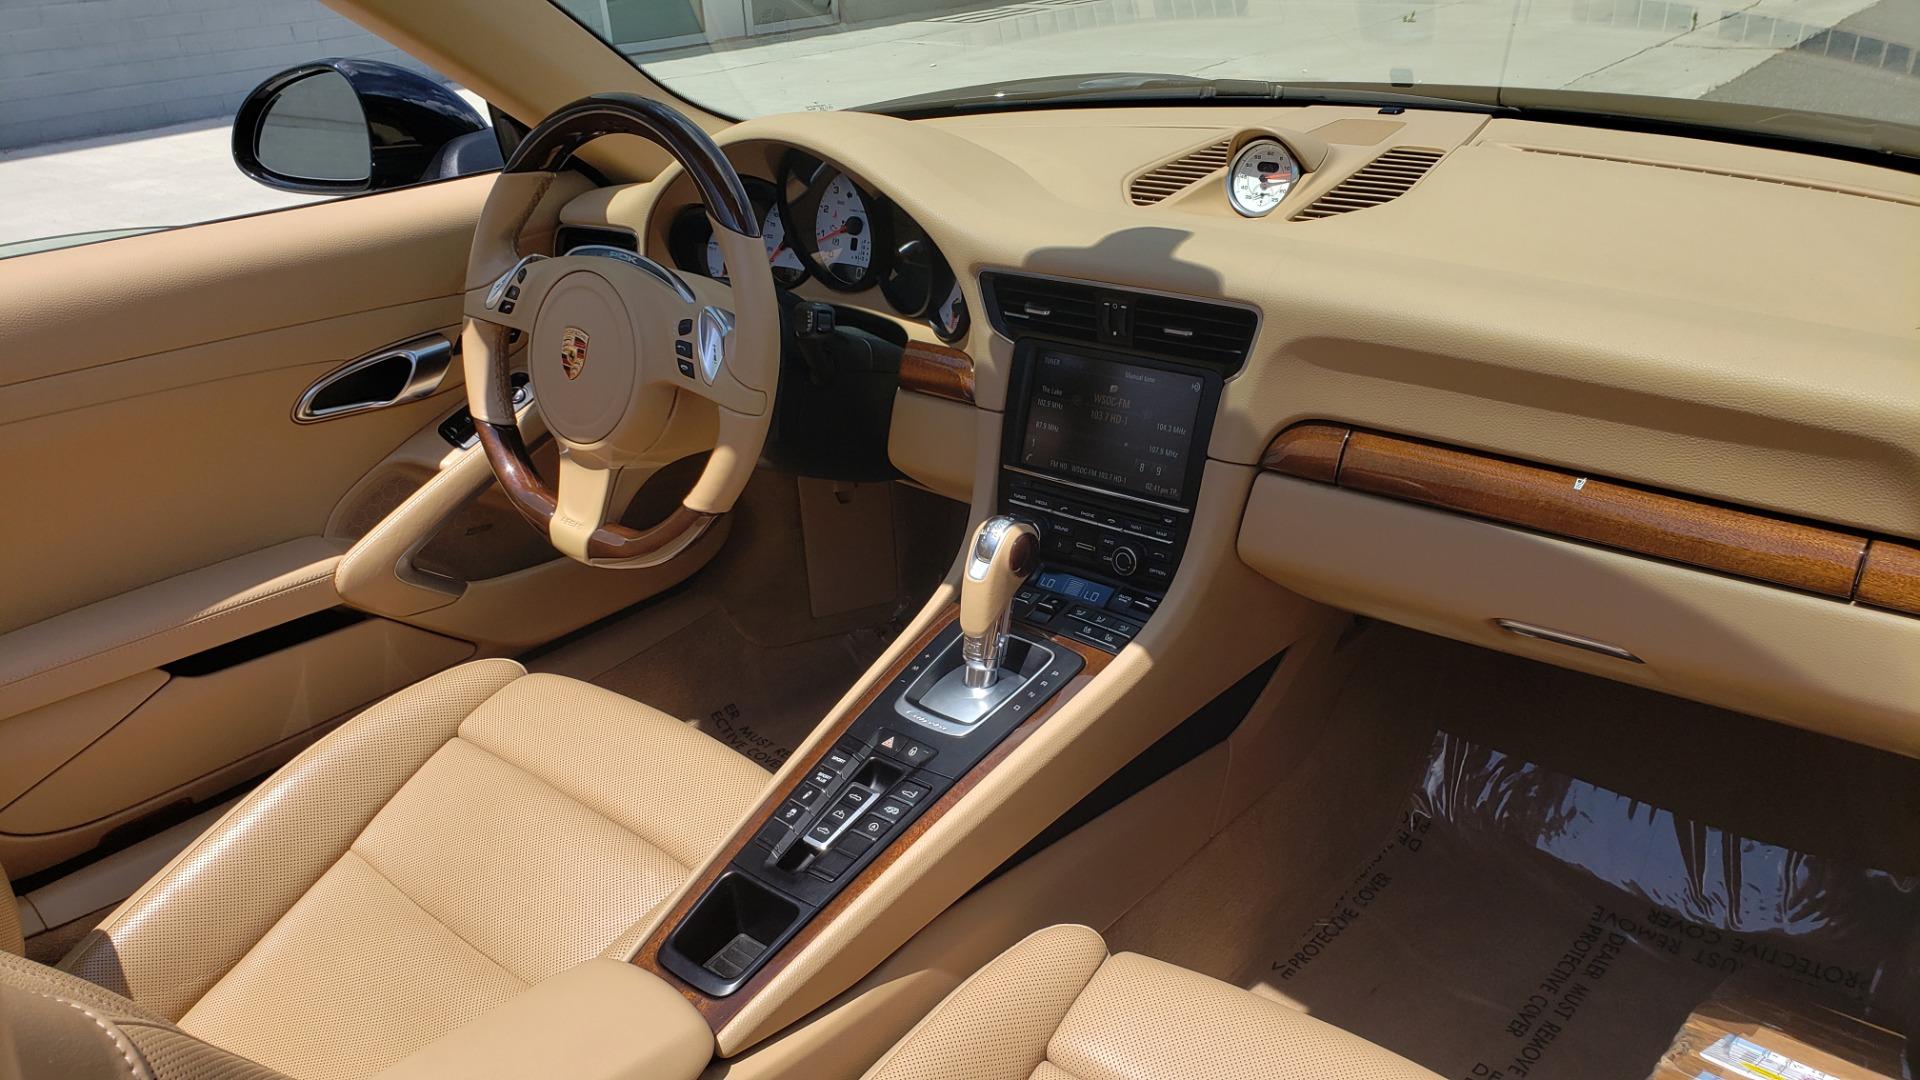 Used 2014 Porsche 911 CARRERA S CABRIOLET / PREM PKG / PDK / NAV / BOSE / SPORT CHRONO for sale $81,995 at Formula Imports in Charlotte NC 28227 34